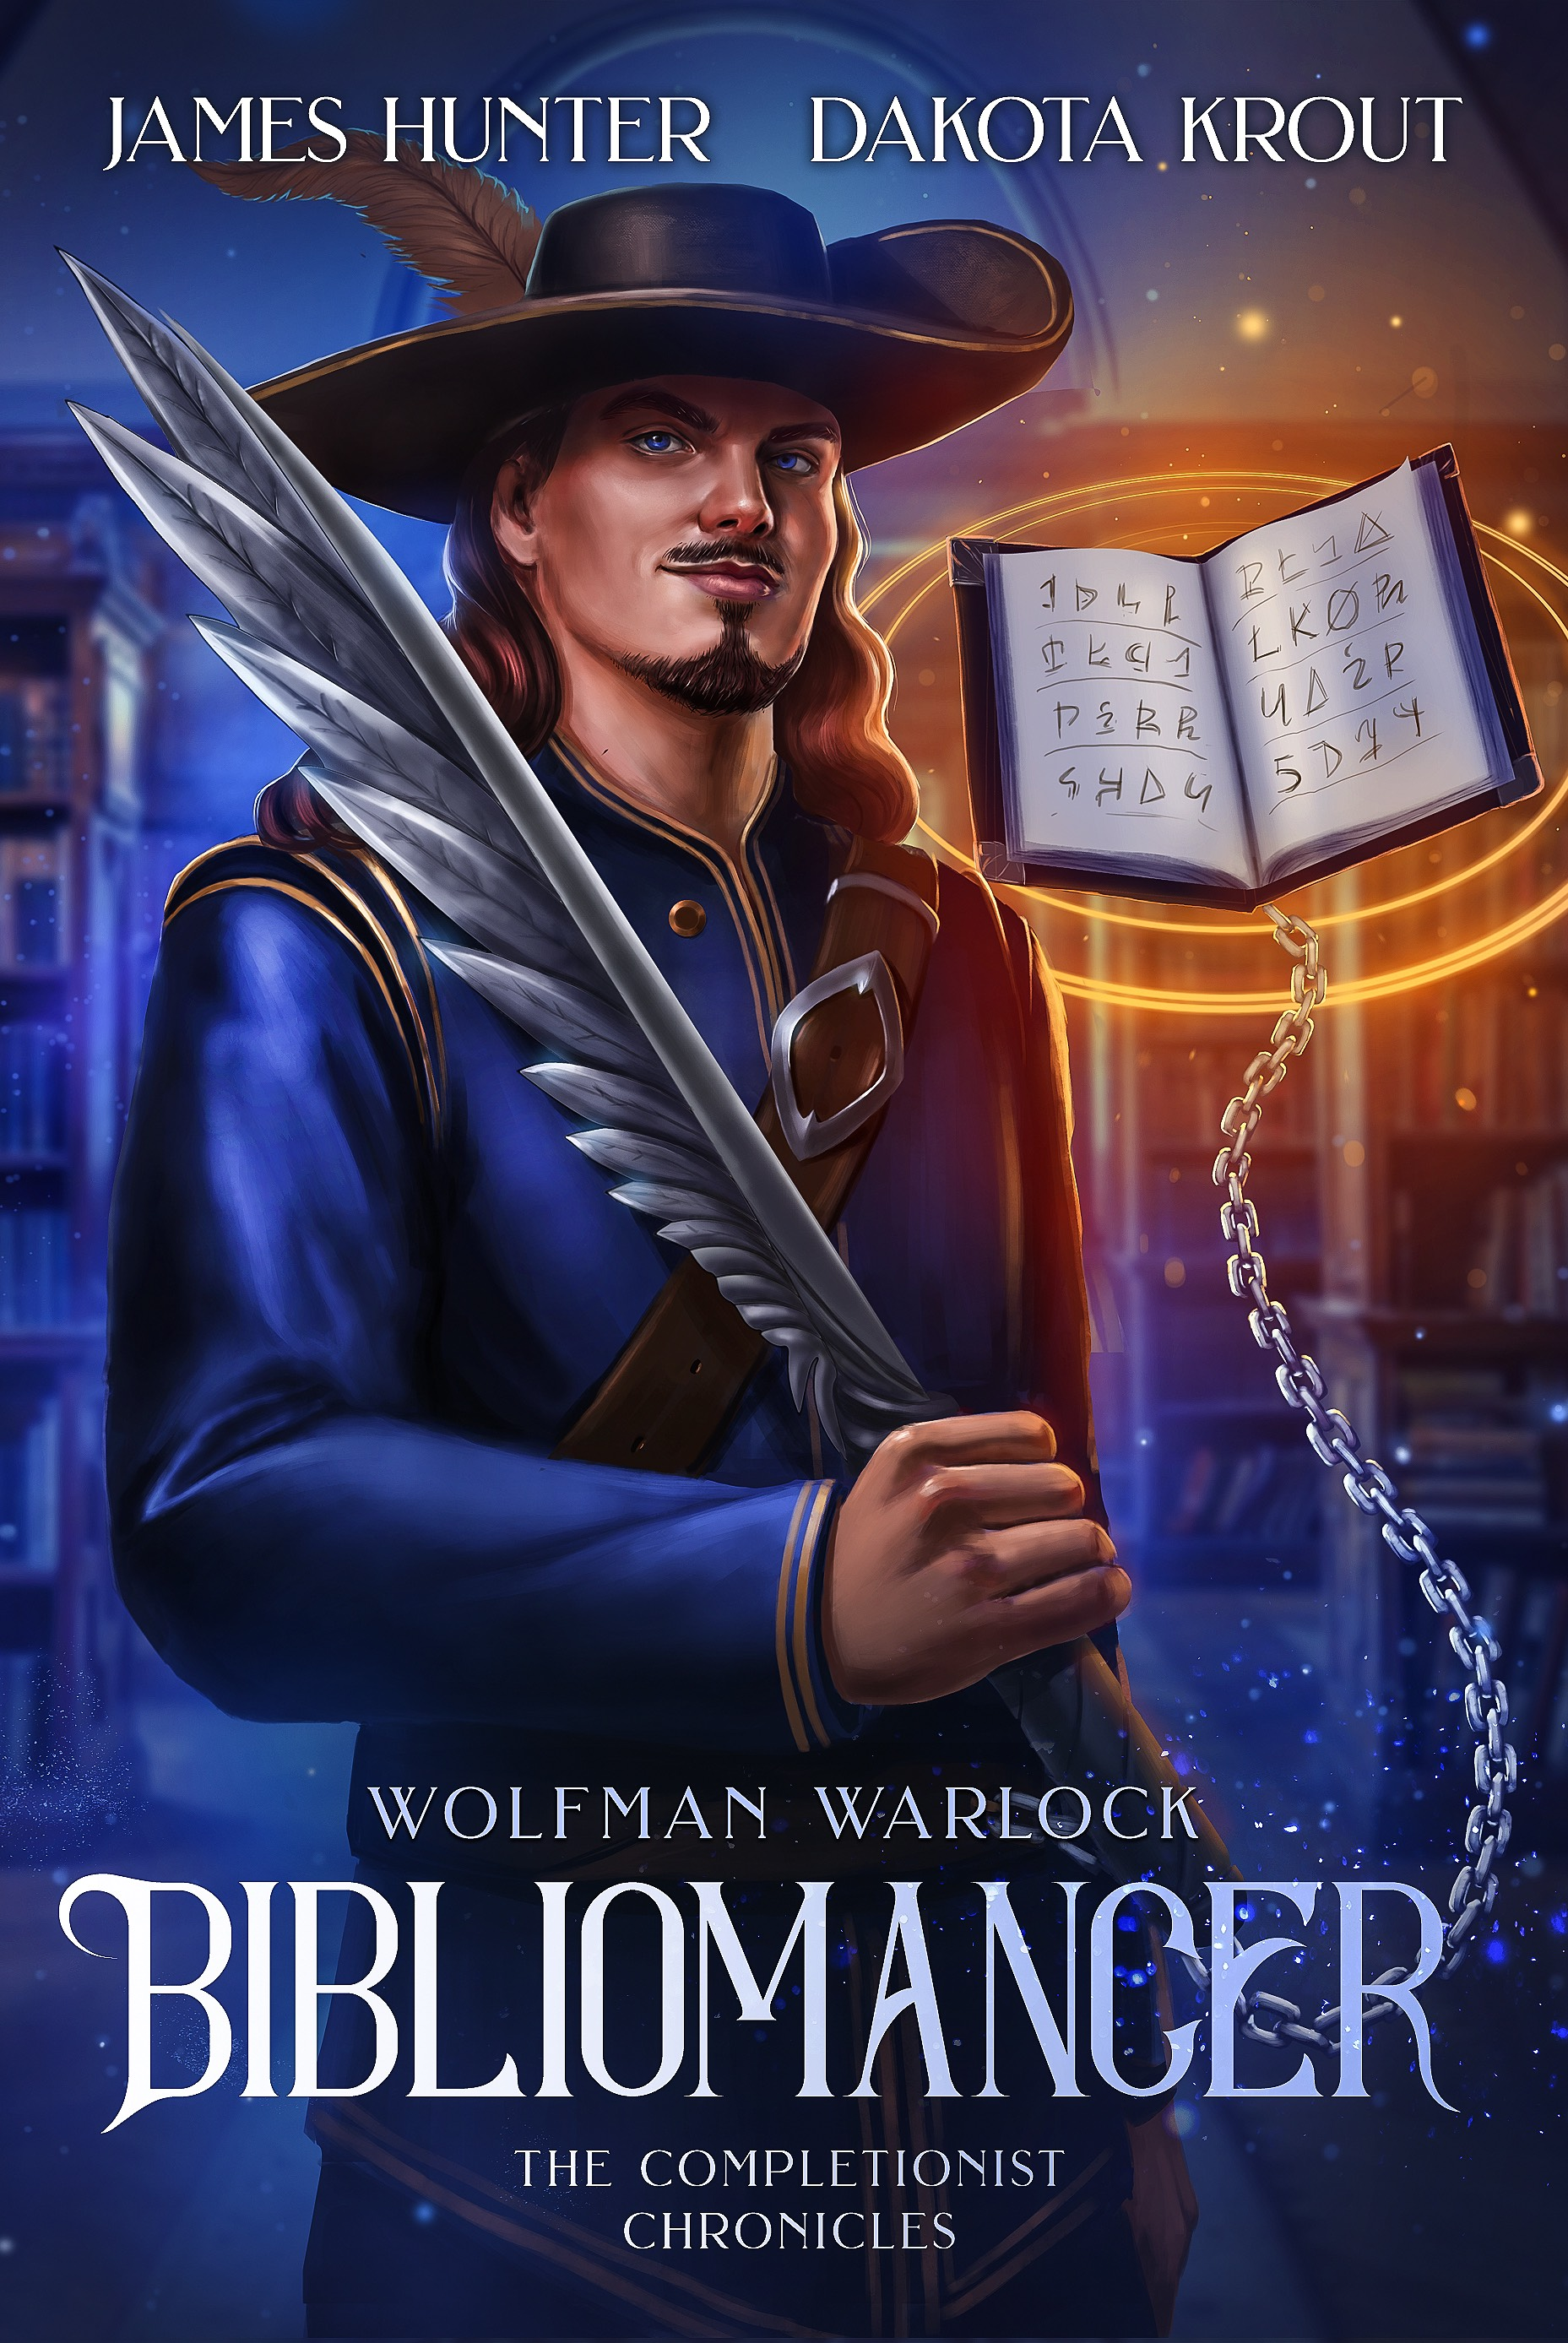 Wolfman Warlock: Bibliomancer